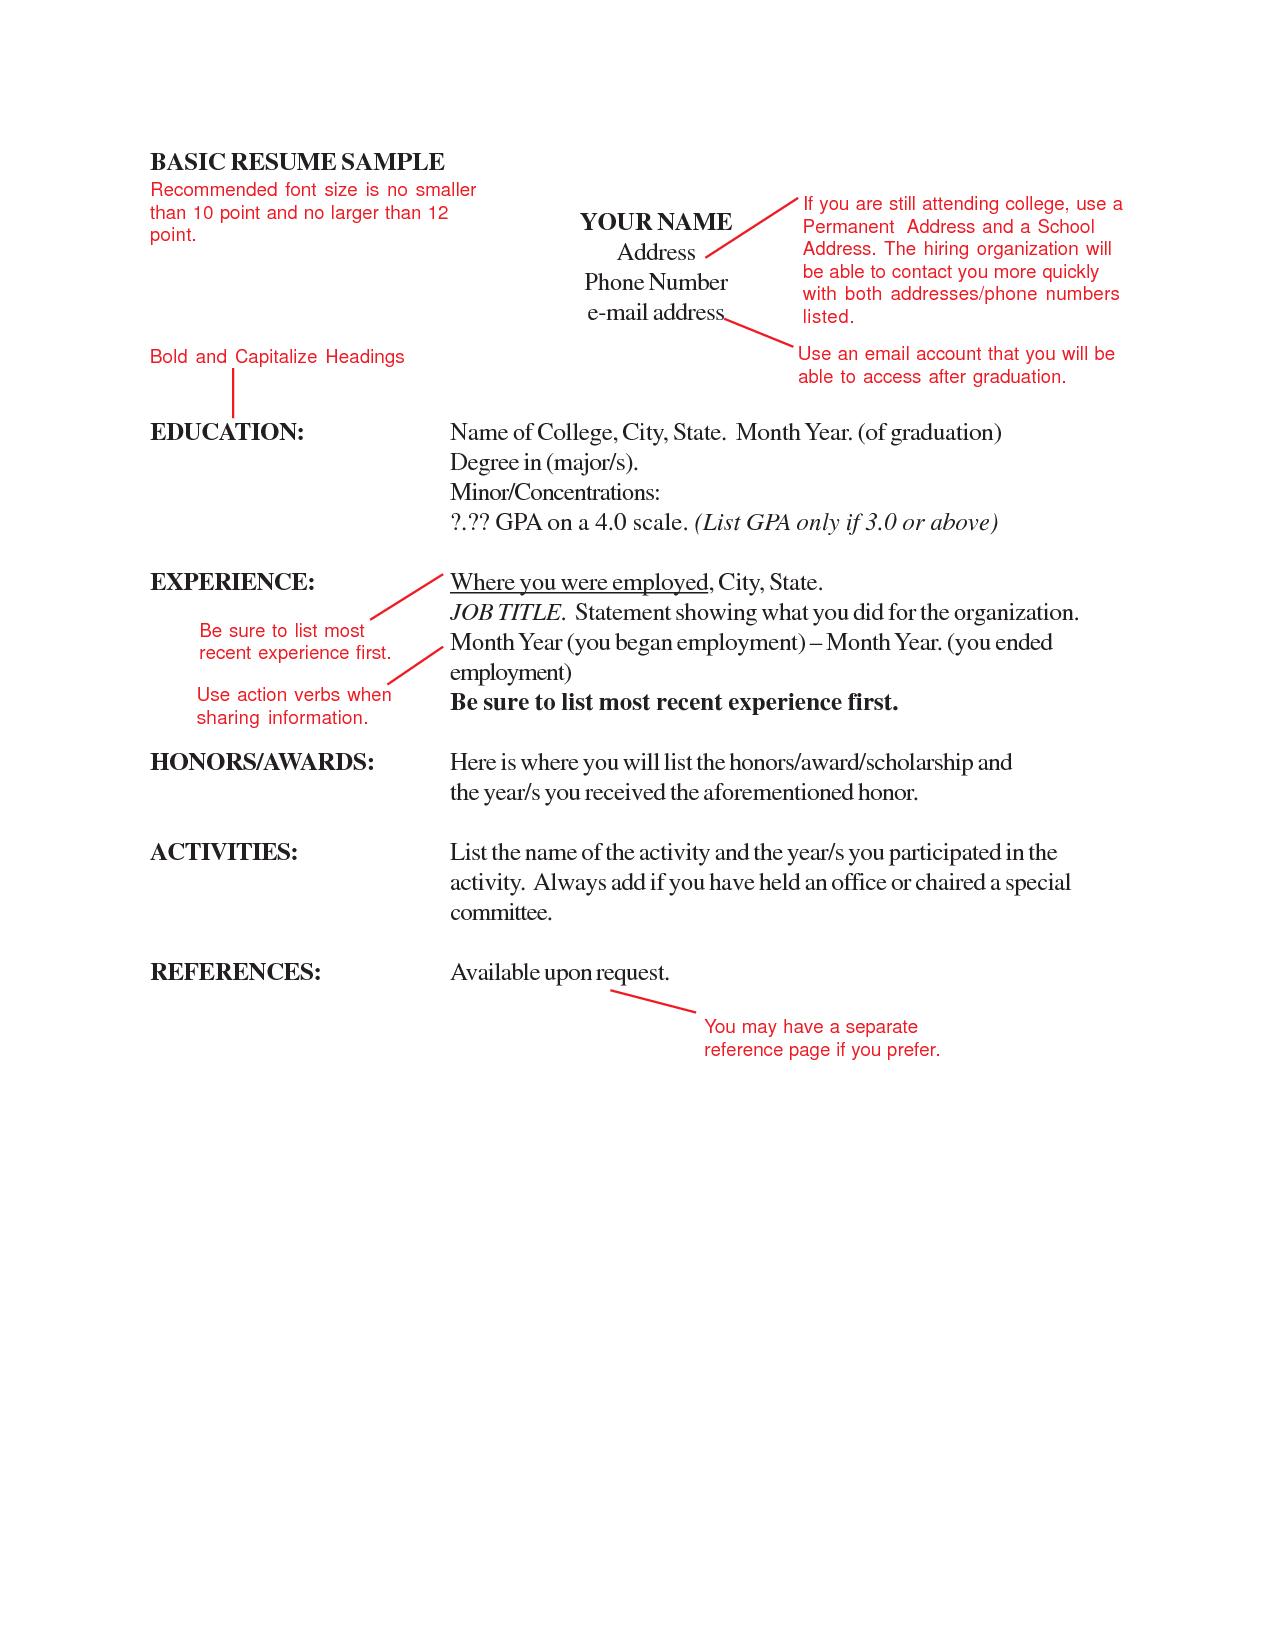 Resume Format Letter Size | Resume Format | Pinterest